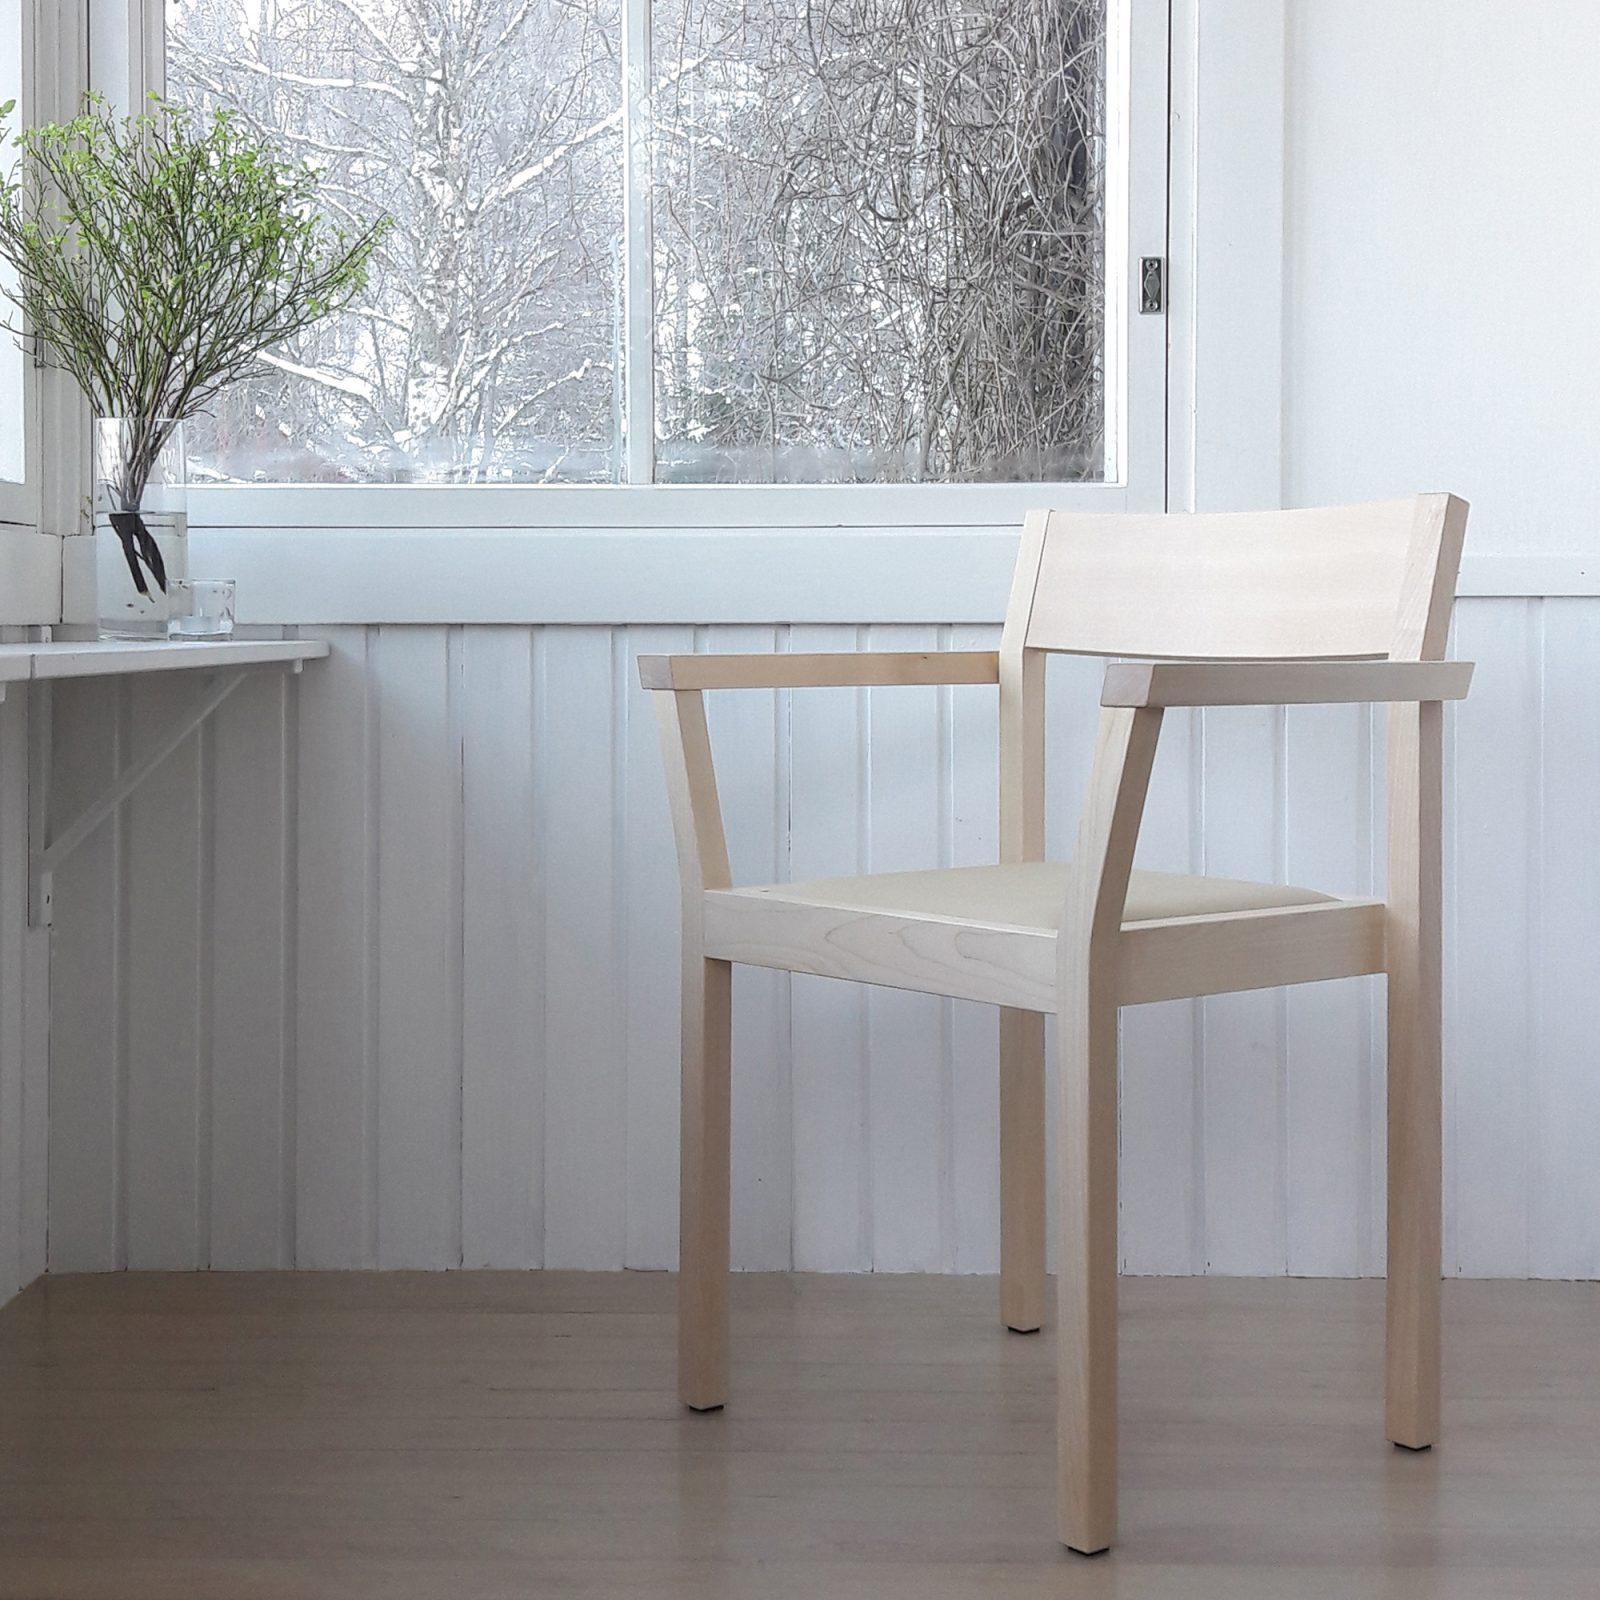 periferia-kvt3-chair-3